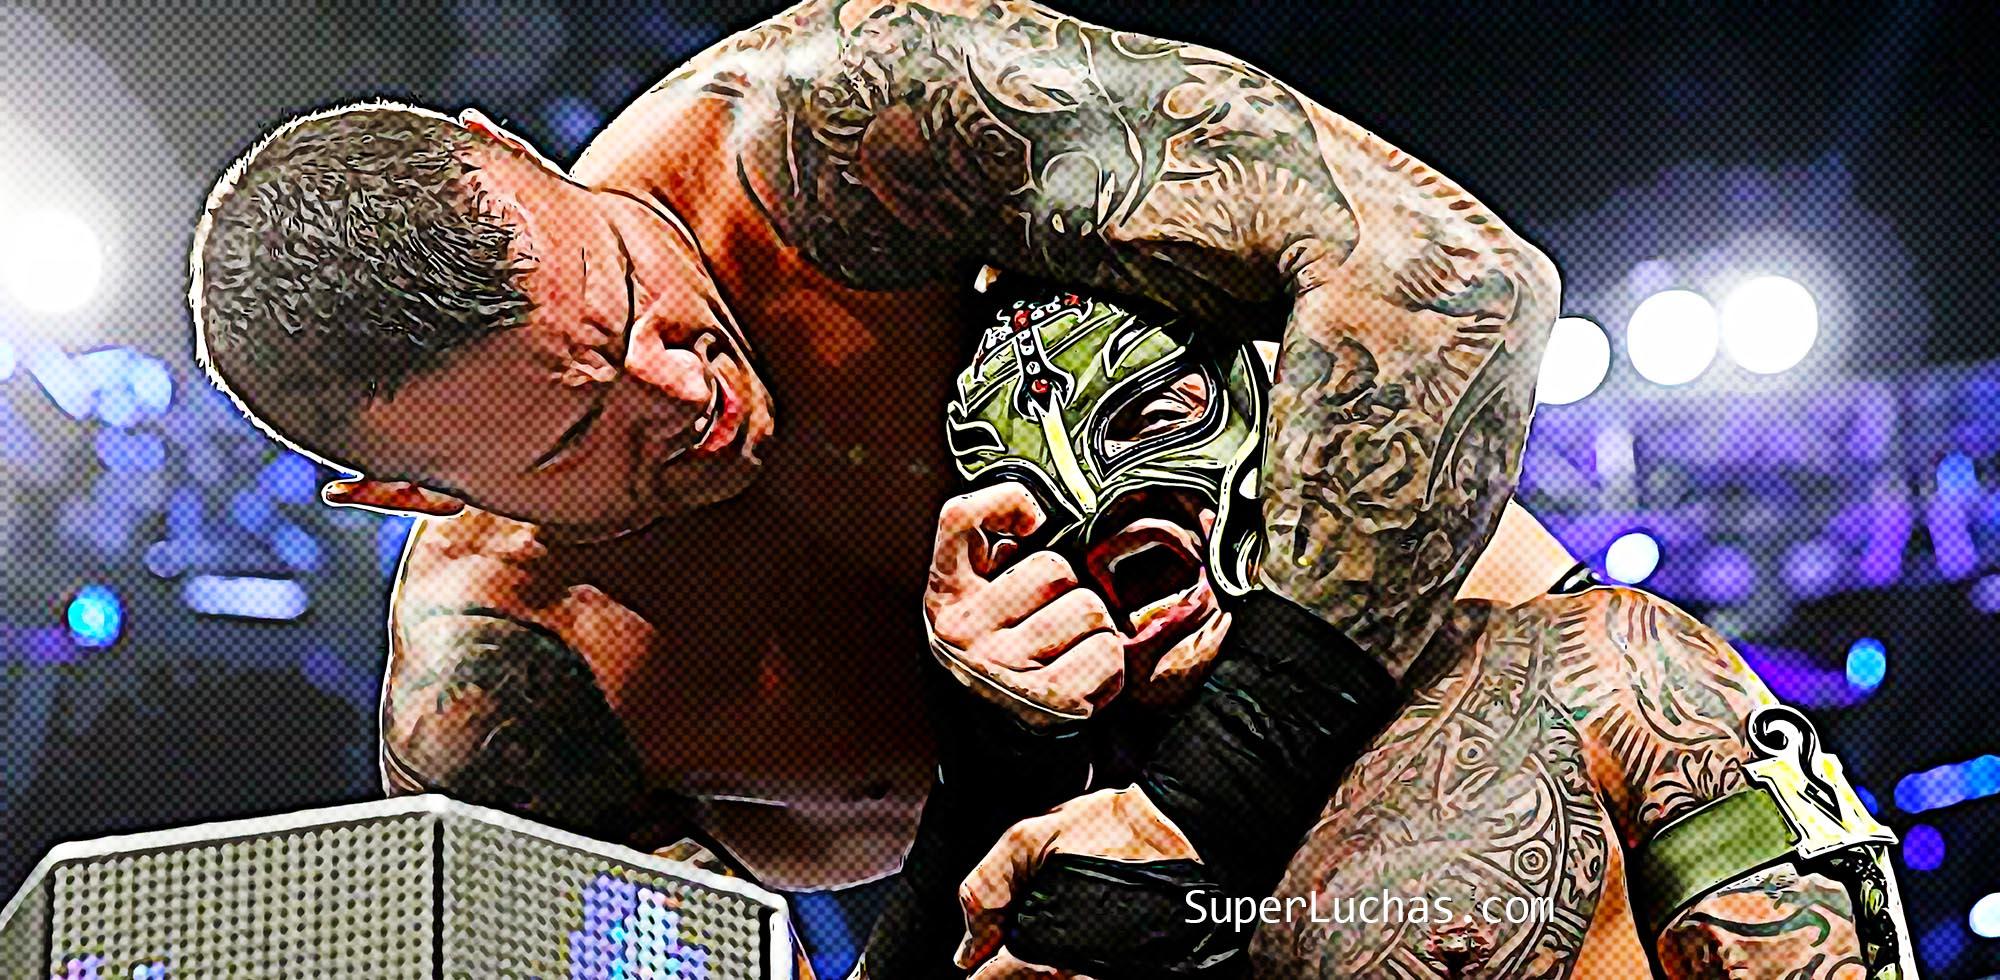 Randy Orton vs Rey Mysterio